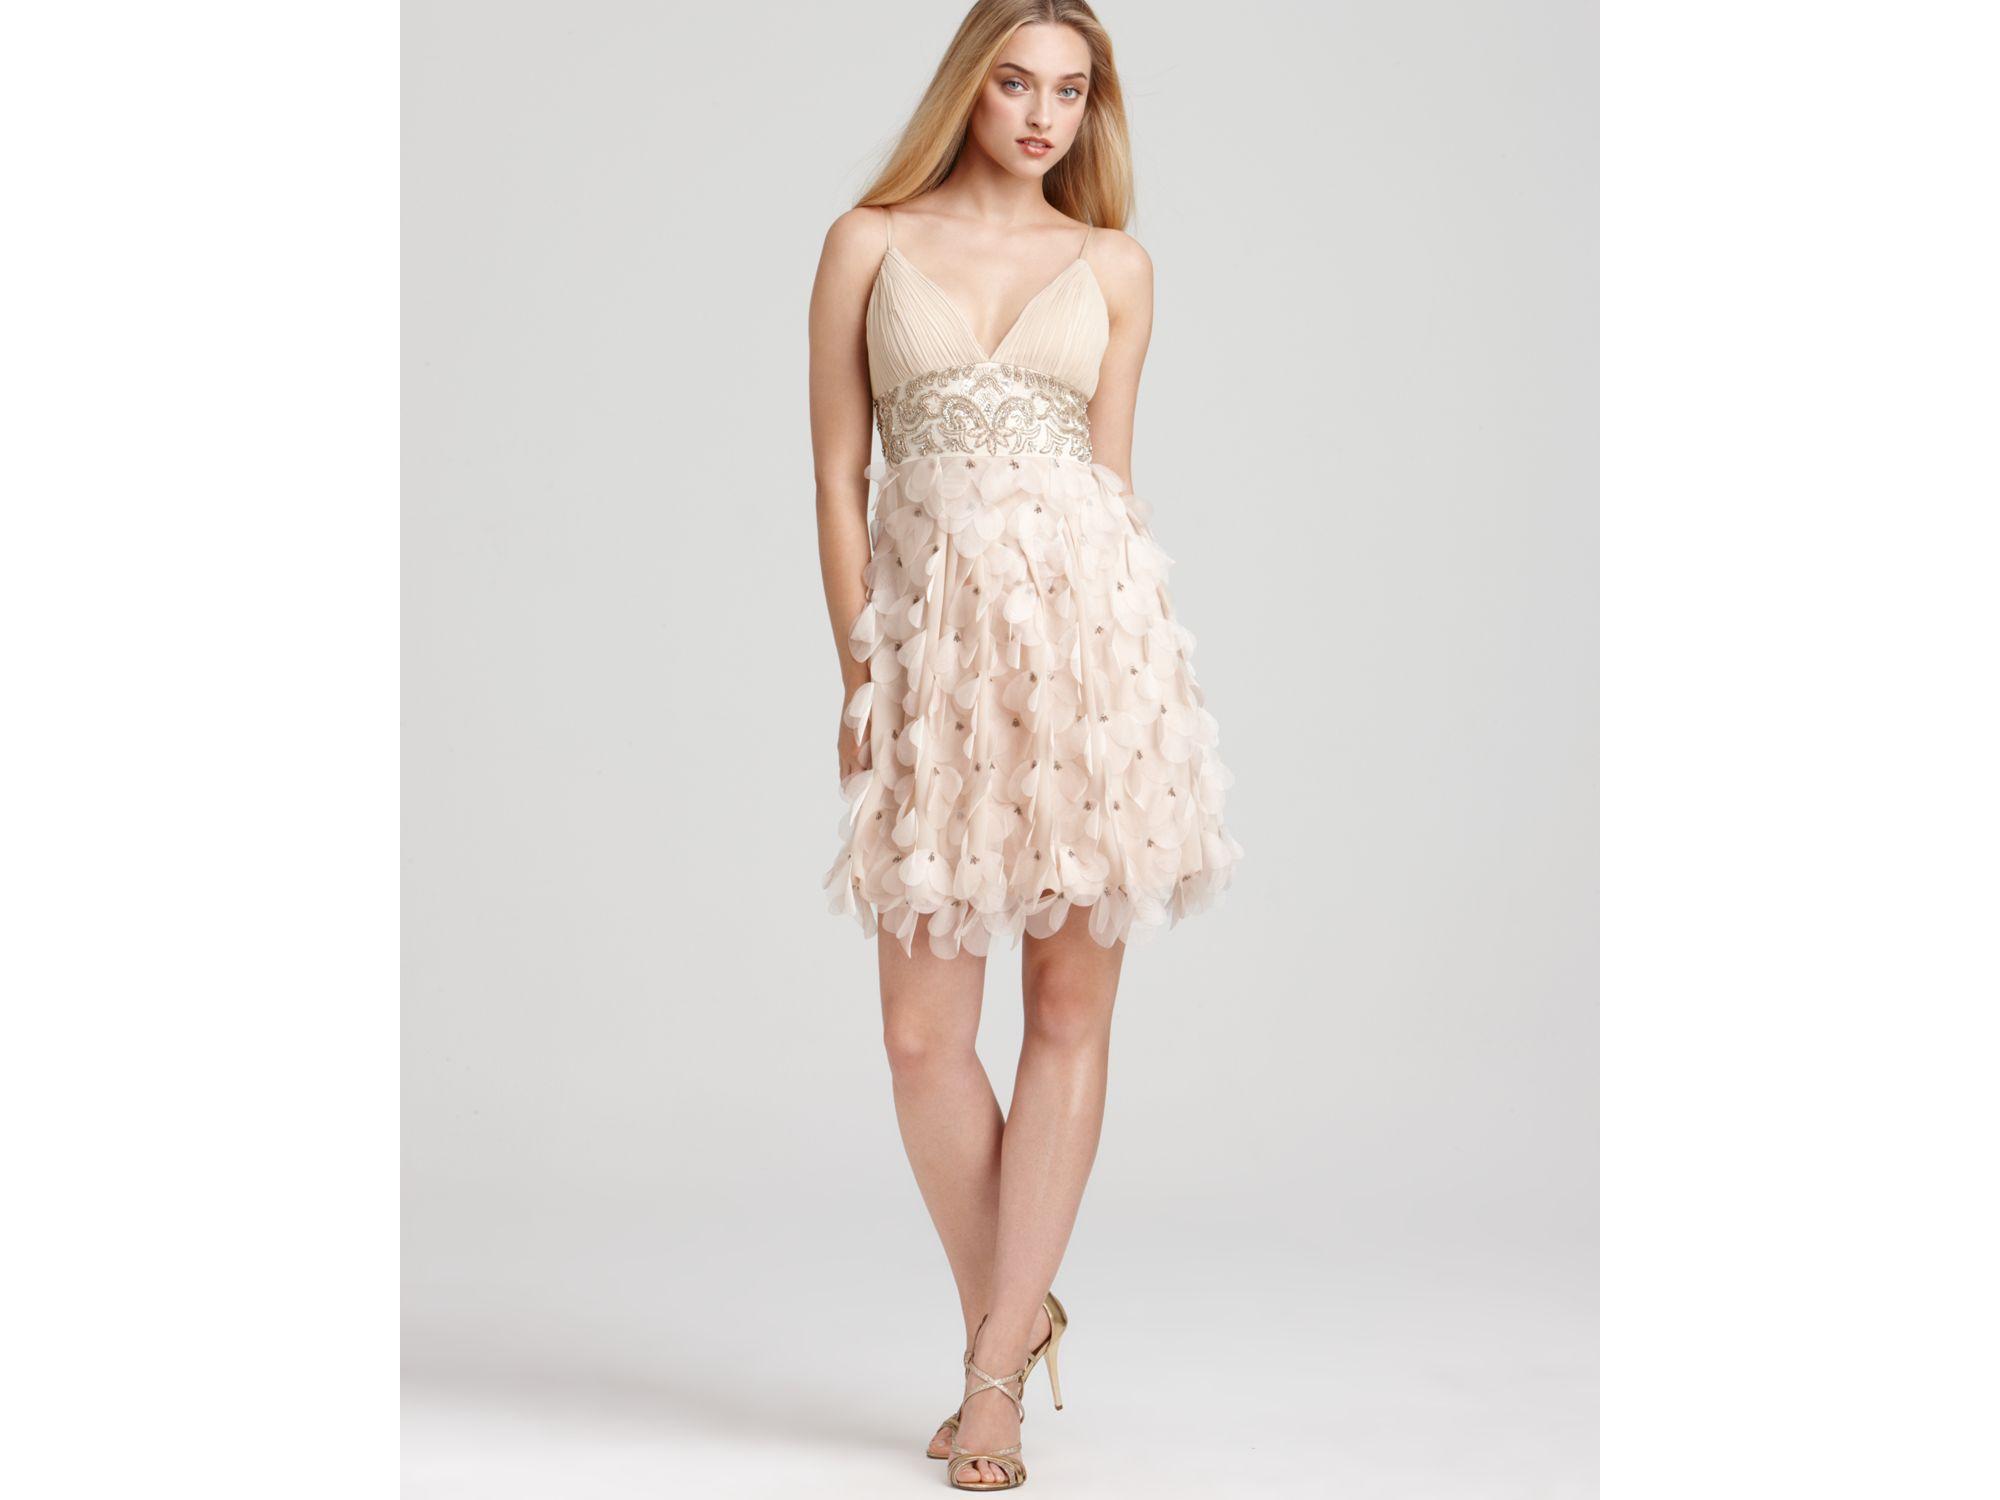 a7897f1df95 Sue Wong Short Petal Beaded Dress in Brown - Lyst